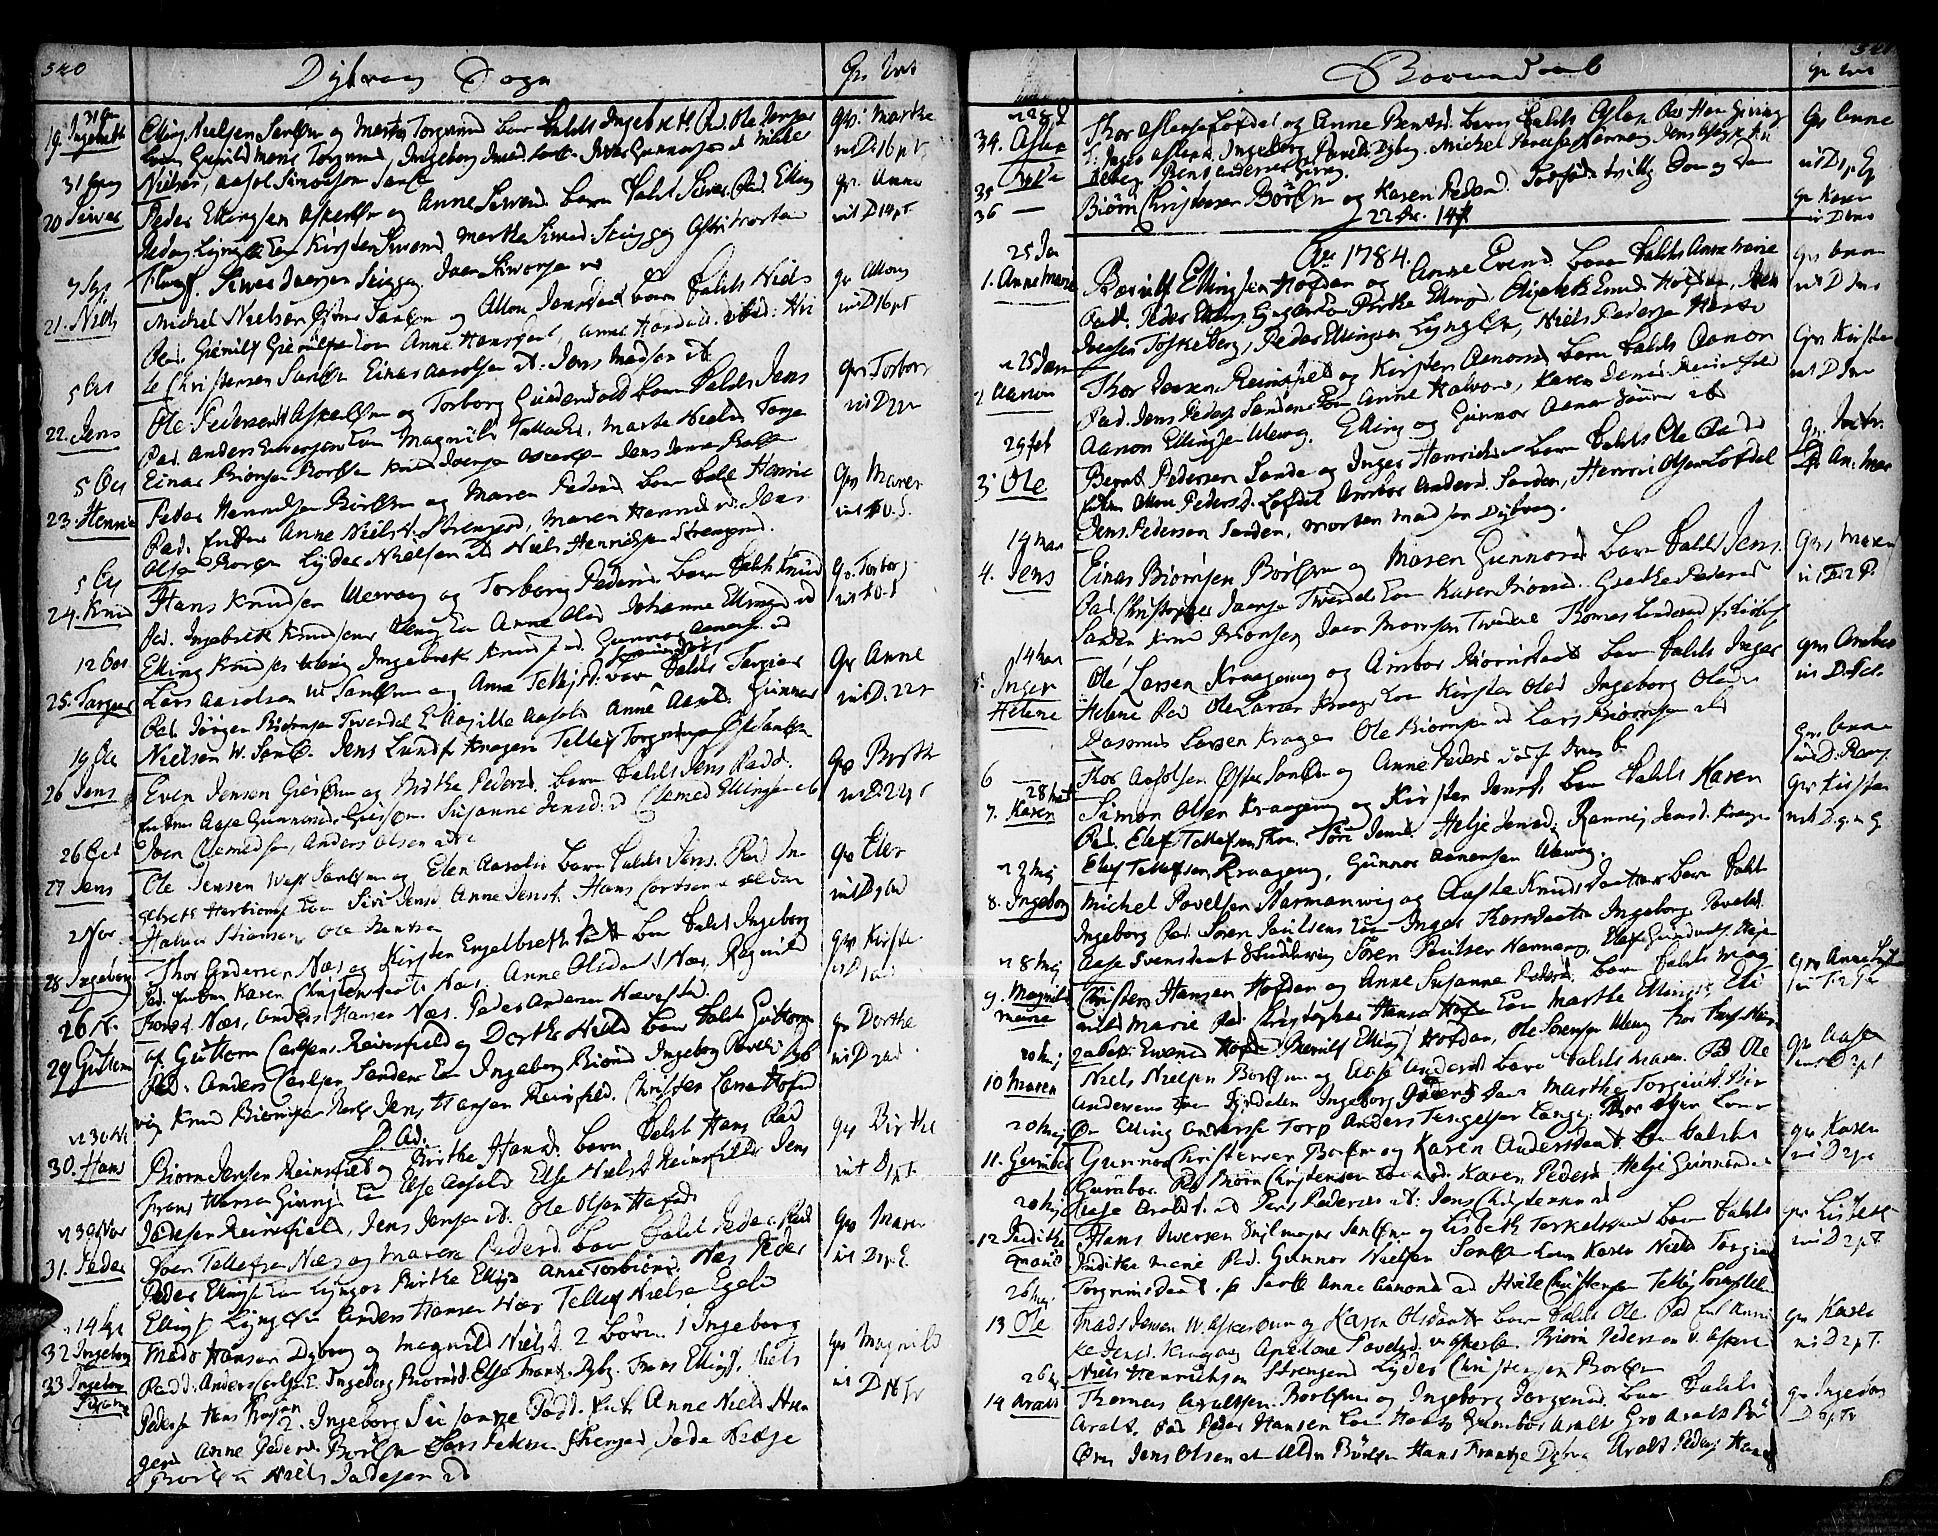 SAK, Dypvåg sokneprestkontor, F/Fa/Faa/L0001: Ministerialbok nr. A 1 /1, 1765-1798, s. 540-541